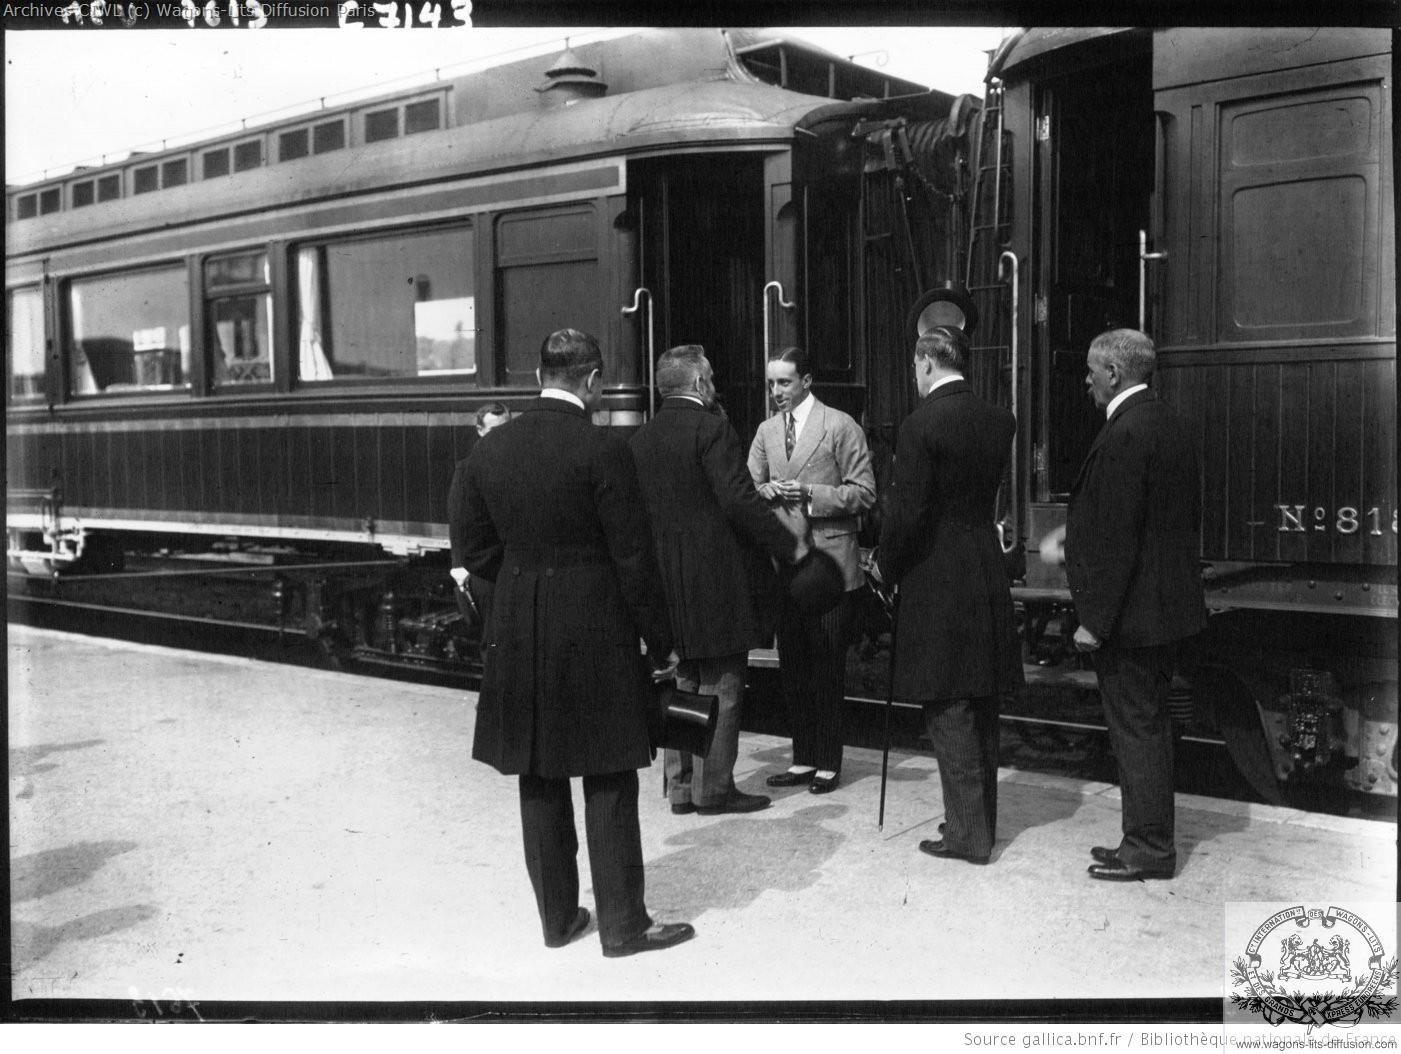 Wl alphonse xiii roi espagne 1910 a cote du wr 818